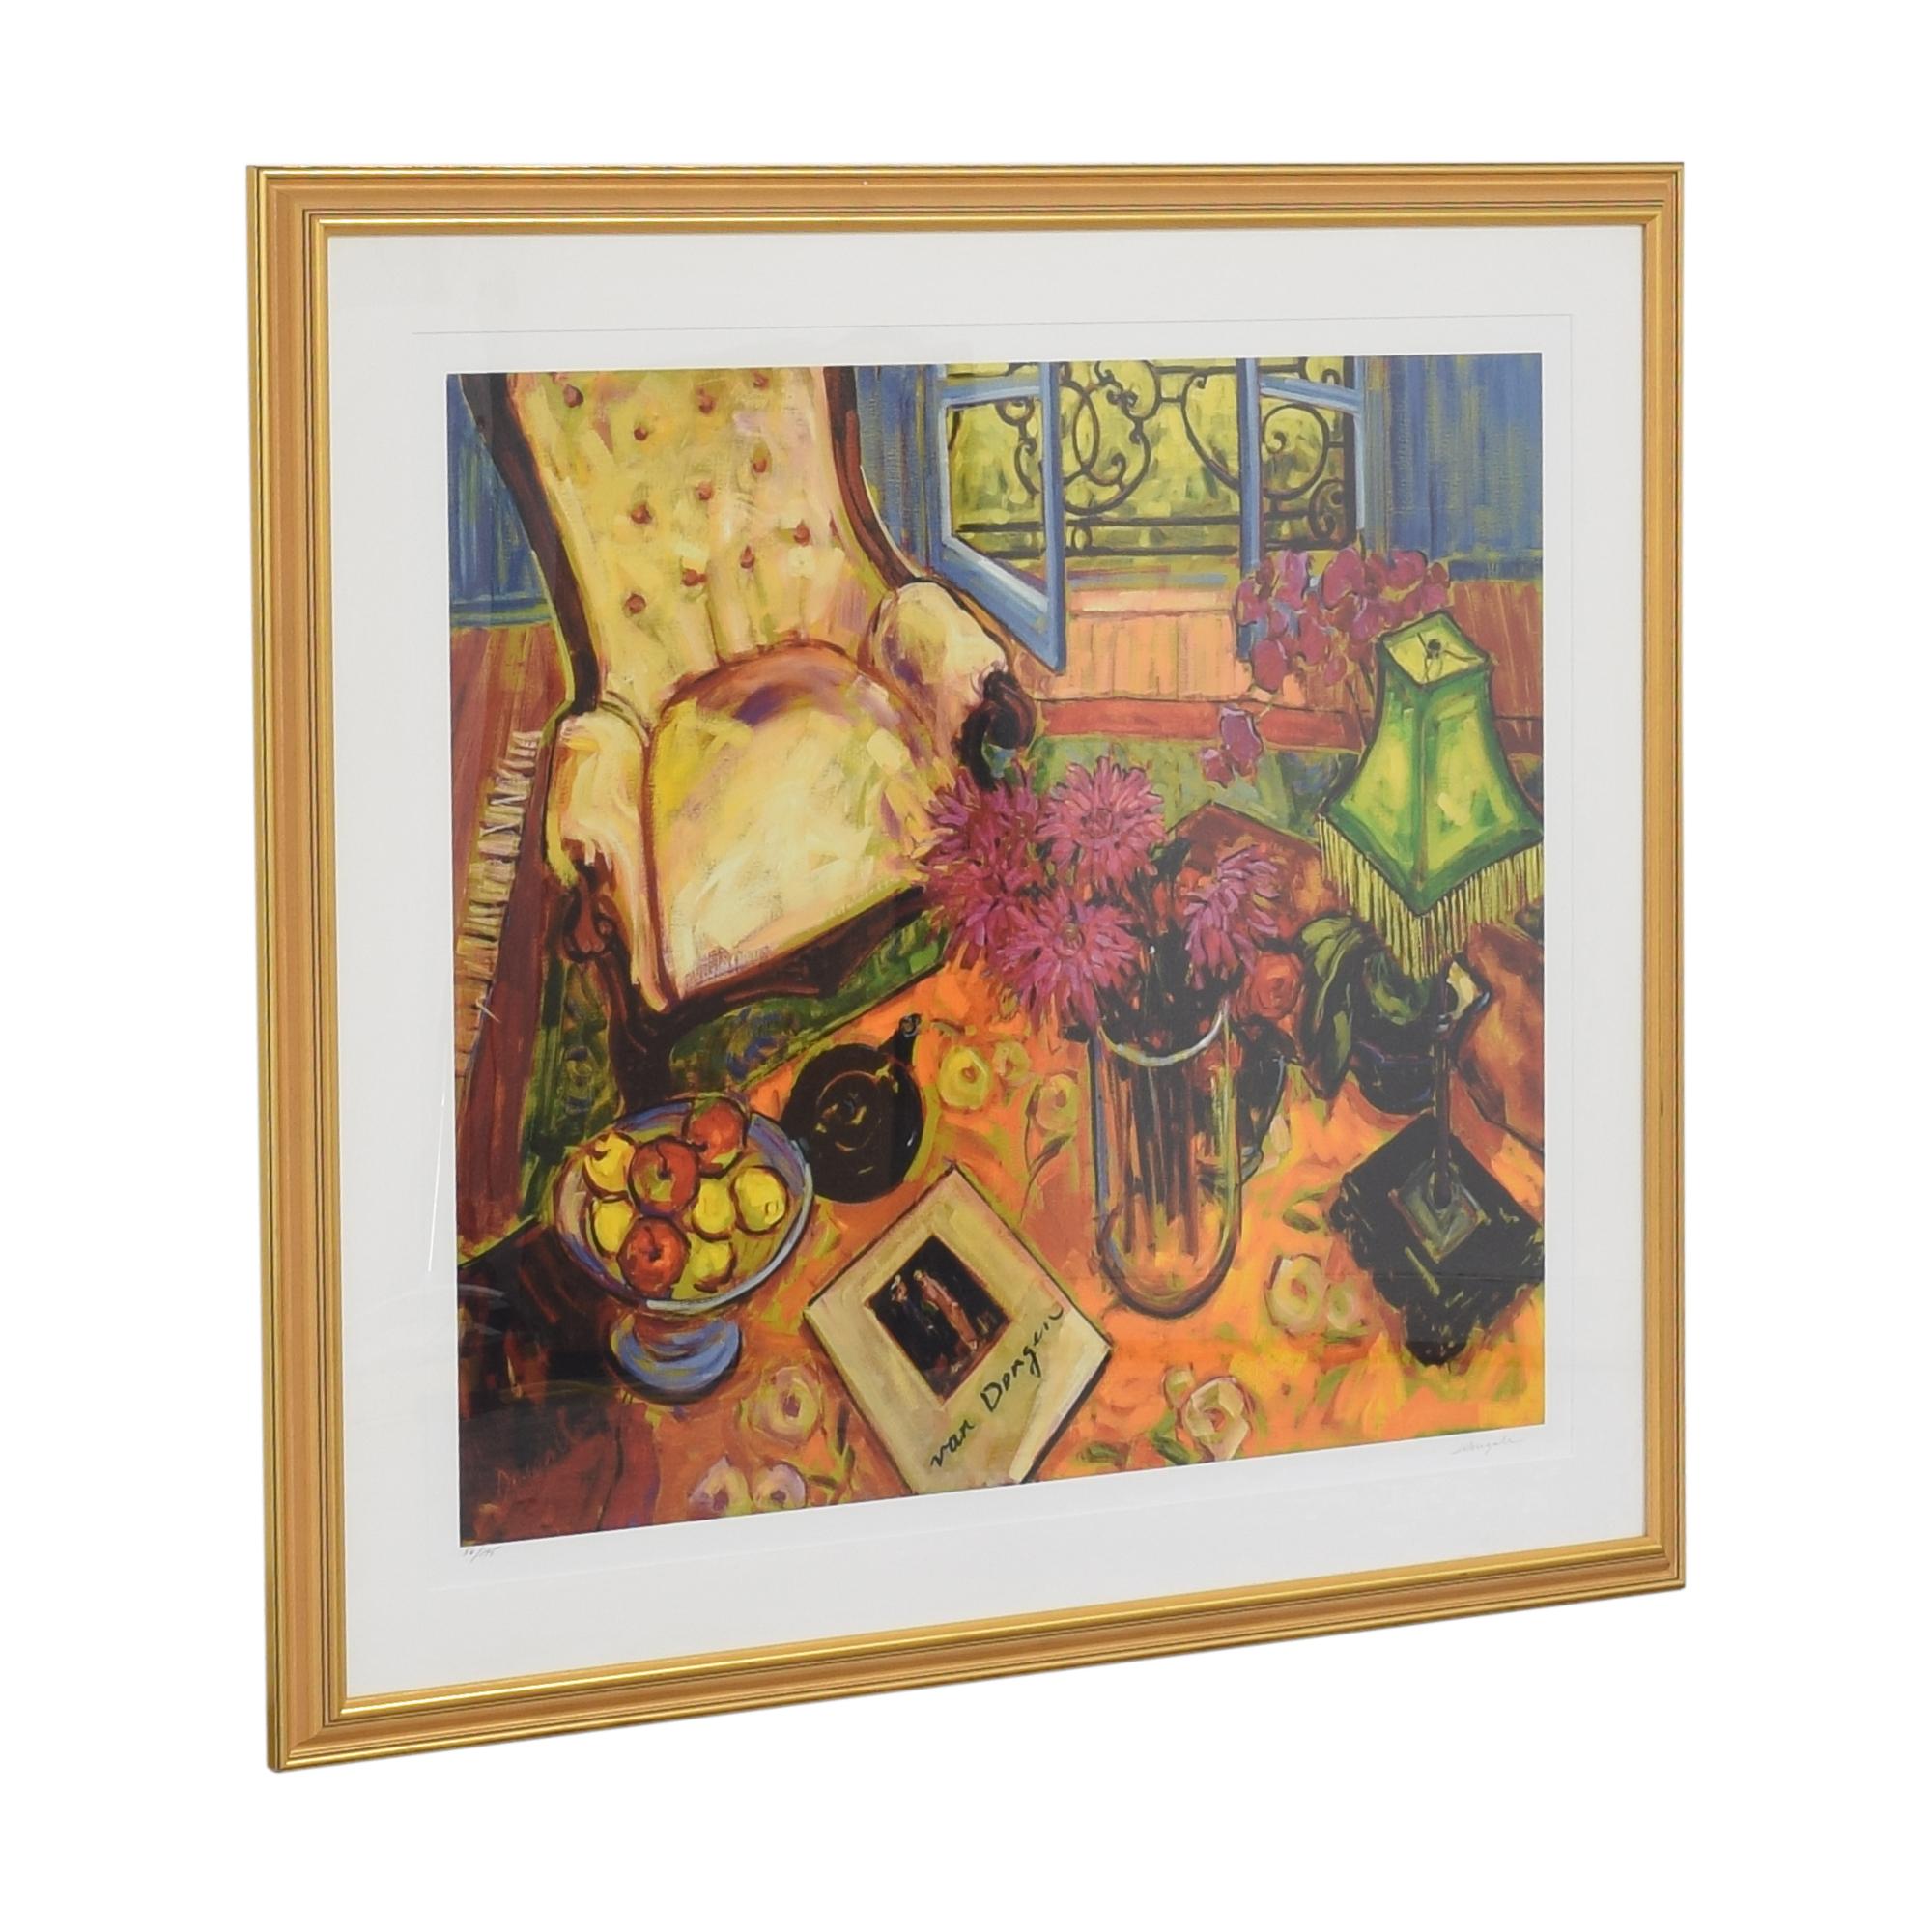 Jae Dougall Framed Wall Art sale